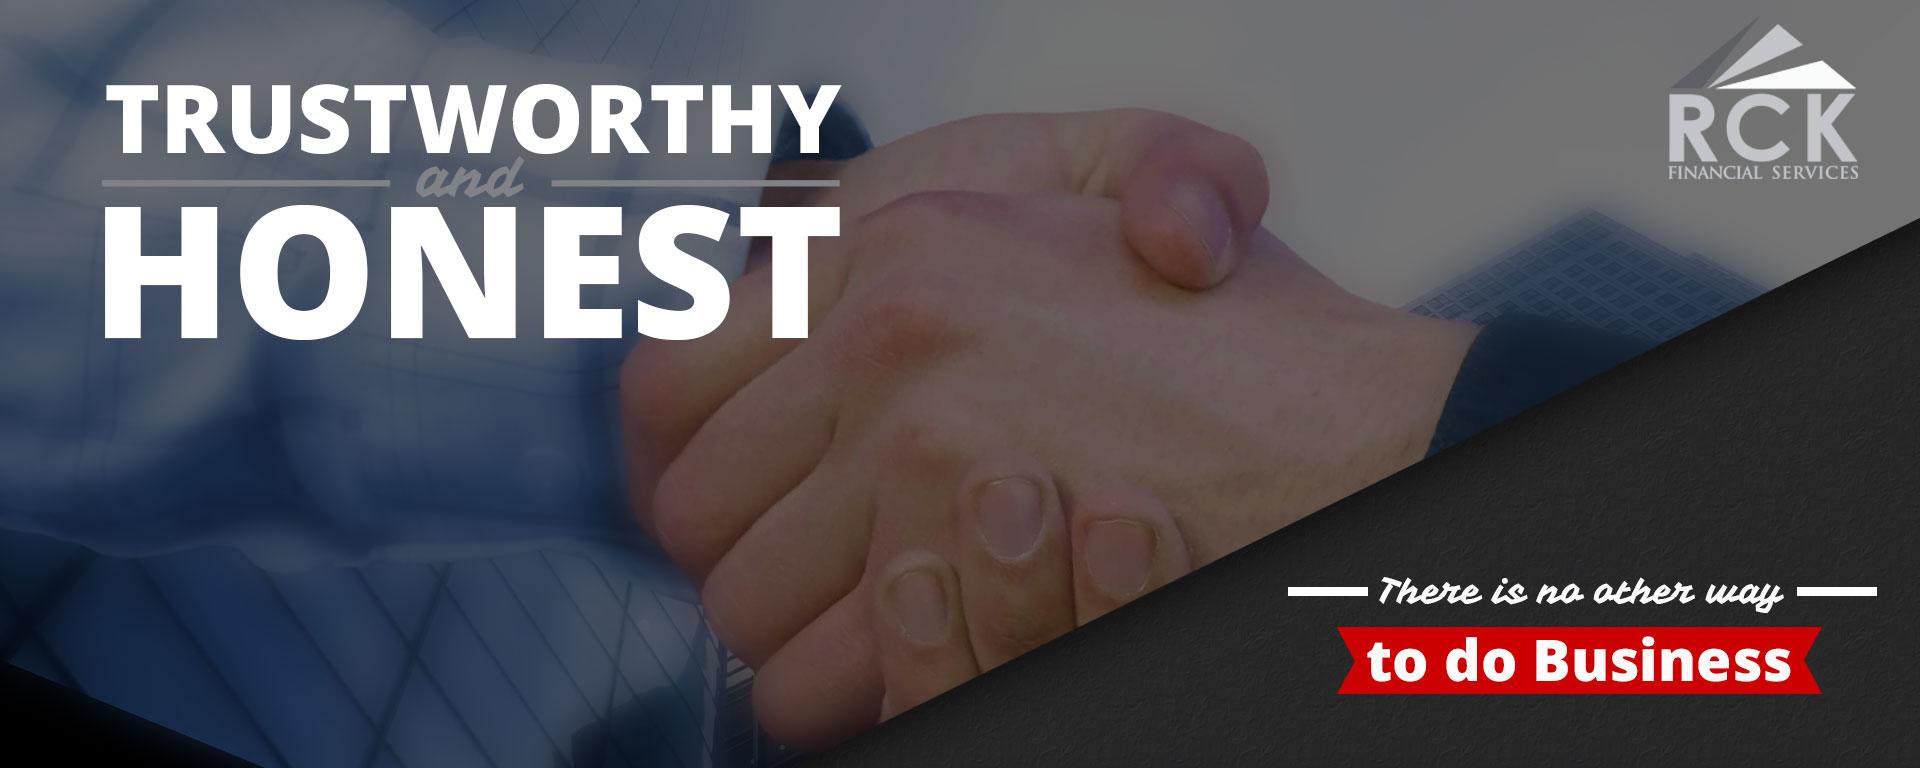 Trustworthy-&-Honest3.jpg